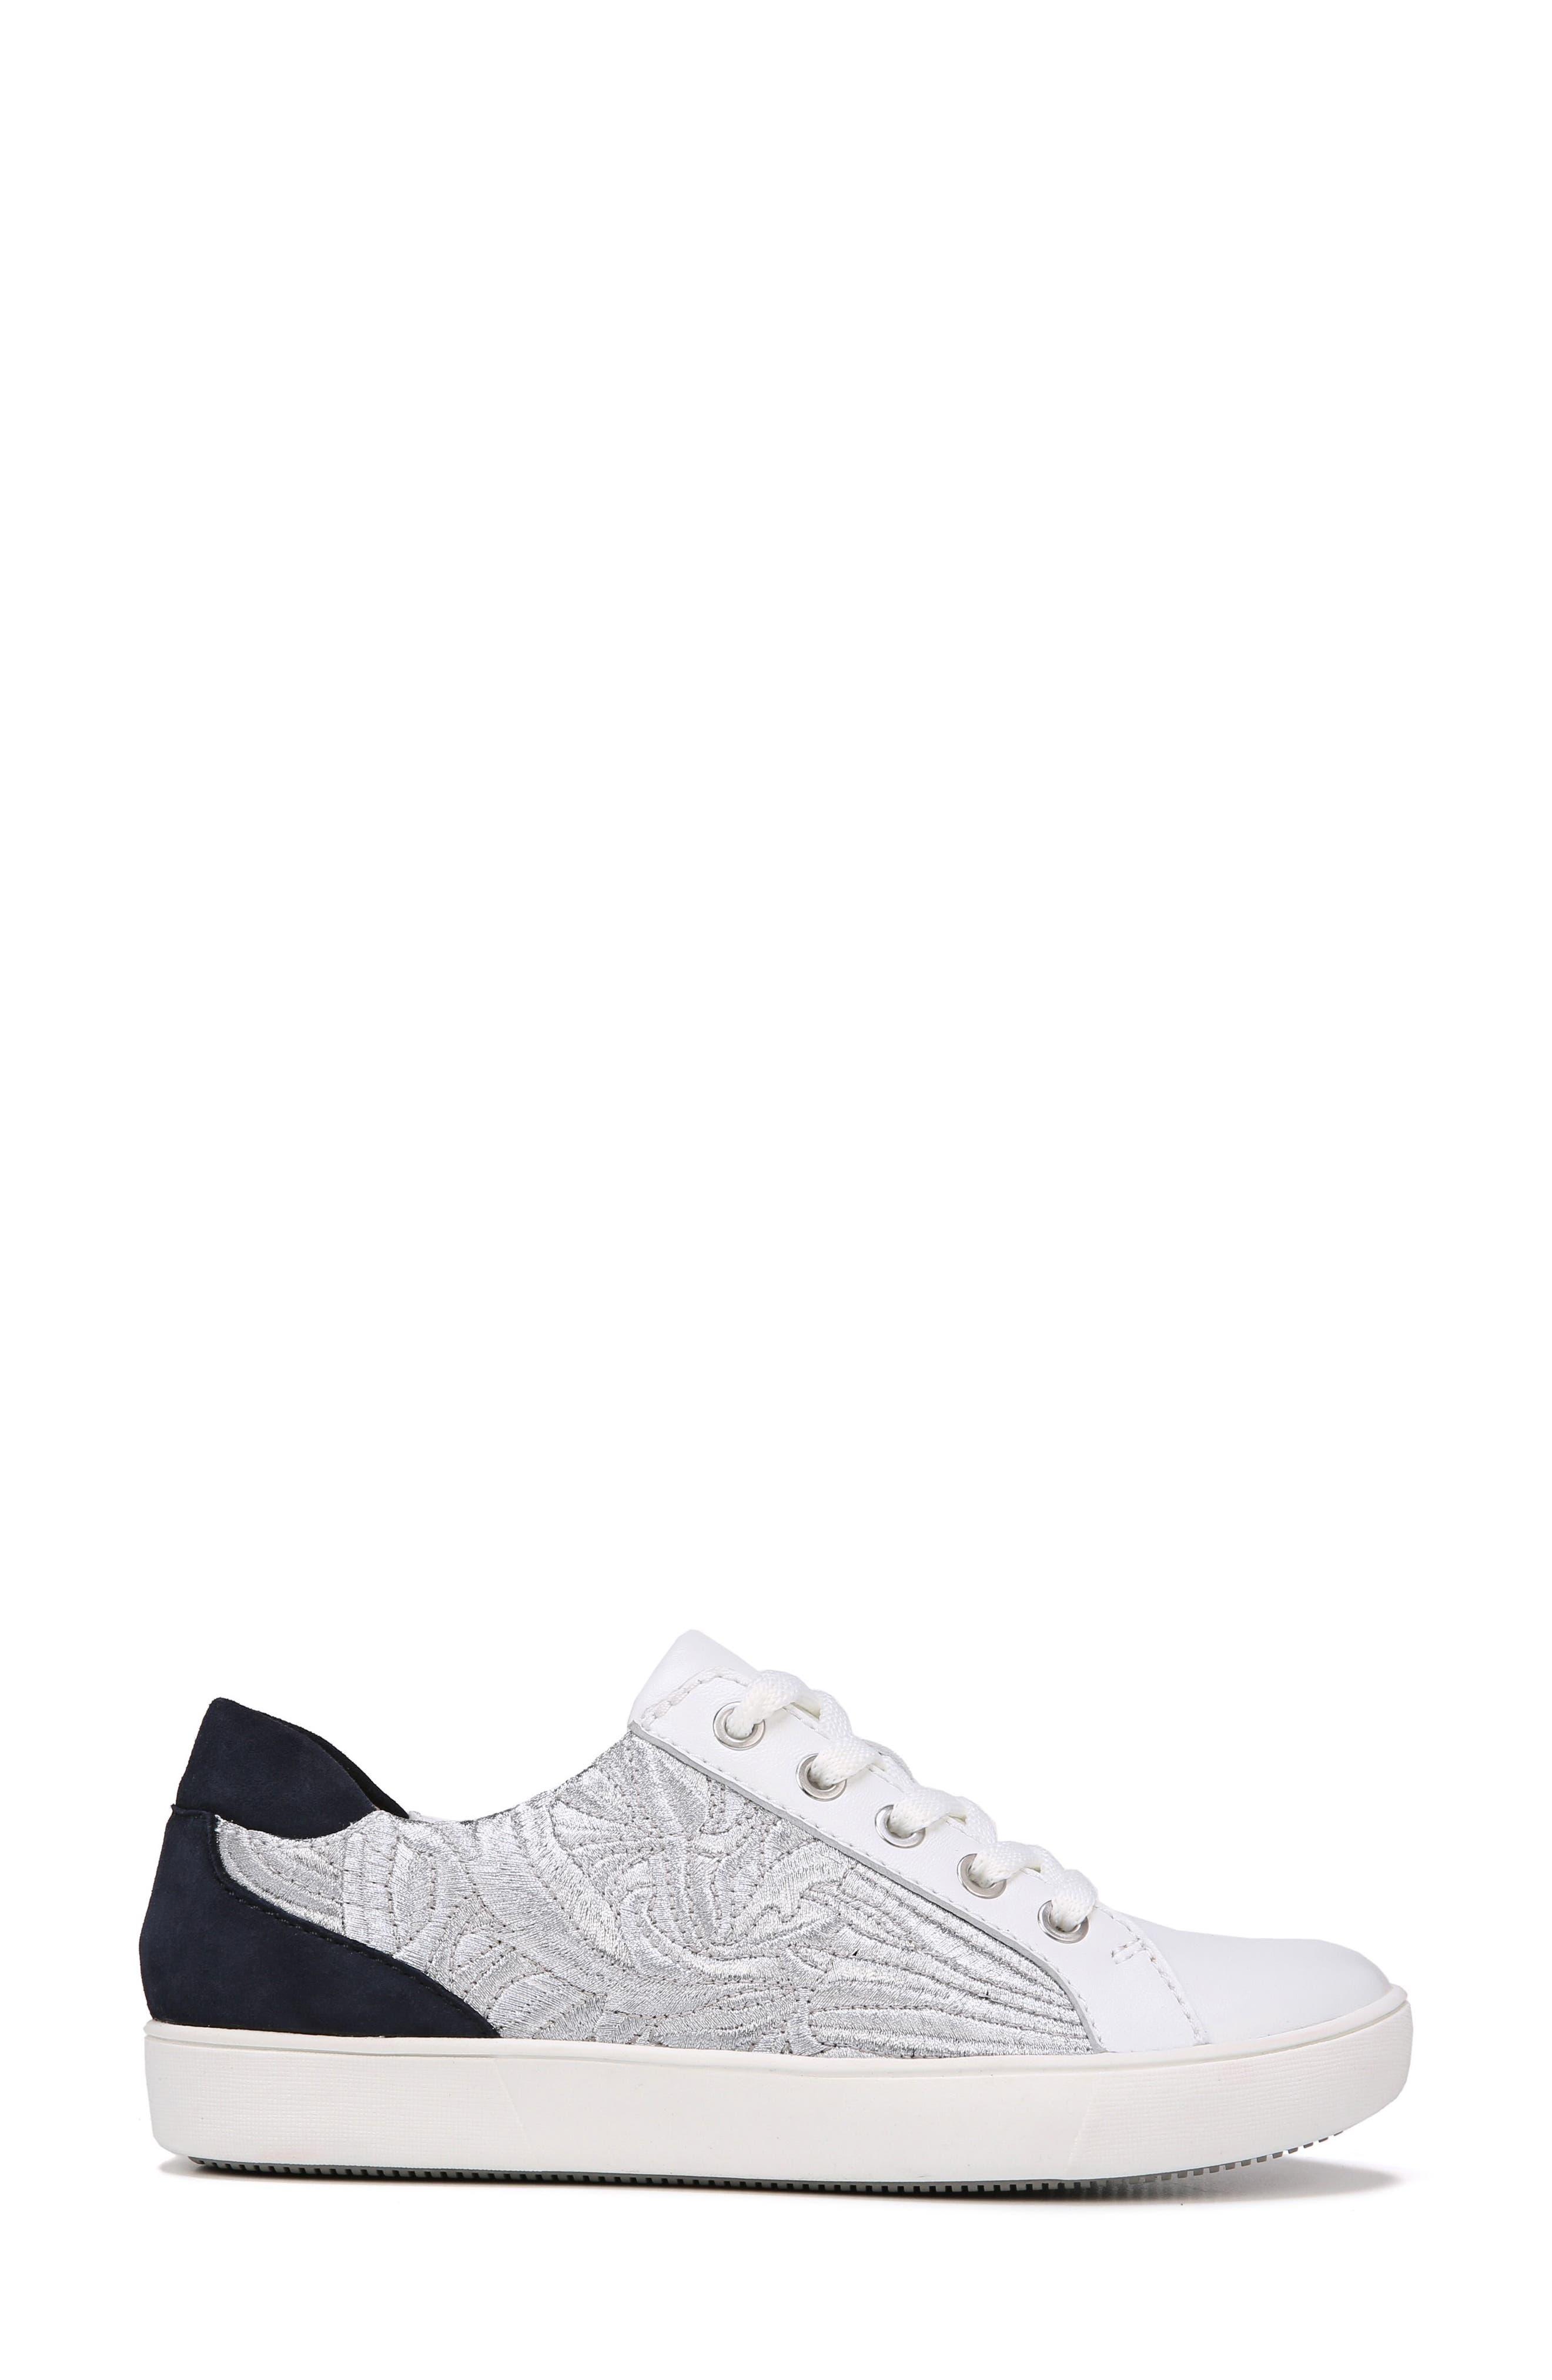 Morrison Sneaker,                             Alternate thumbnail 5, color,                             White/ Silver Leather